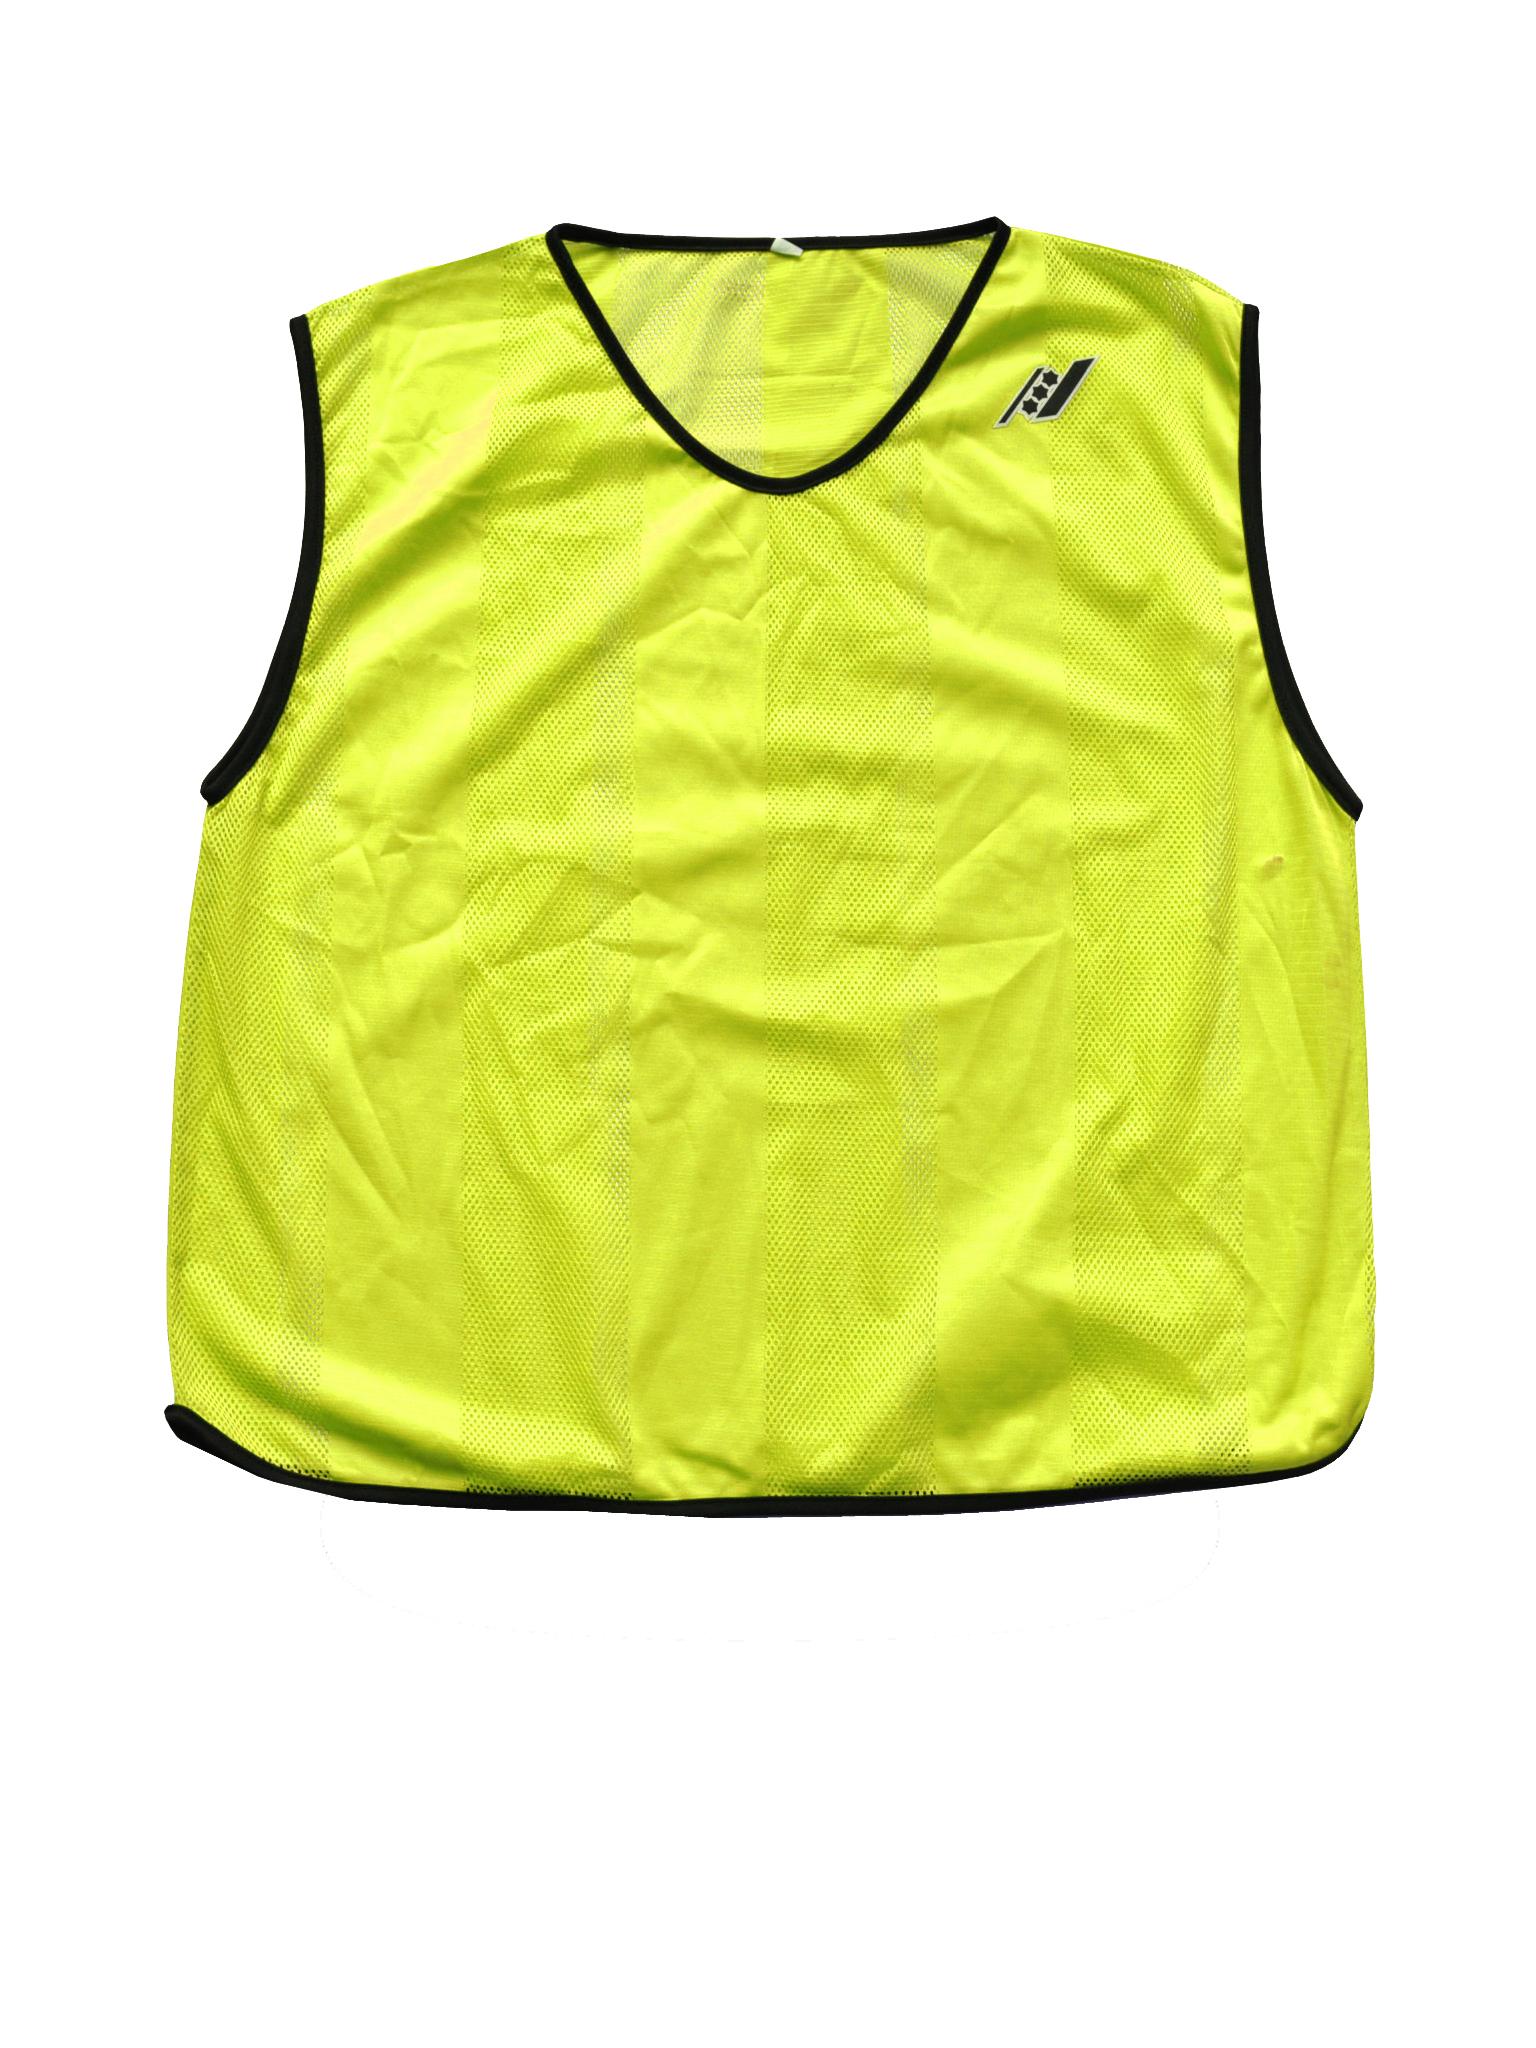 Image of   Rucanor Energy Training Vest - Neon Gul - Senior